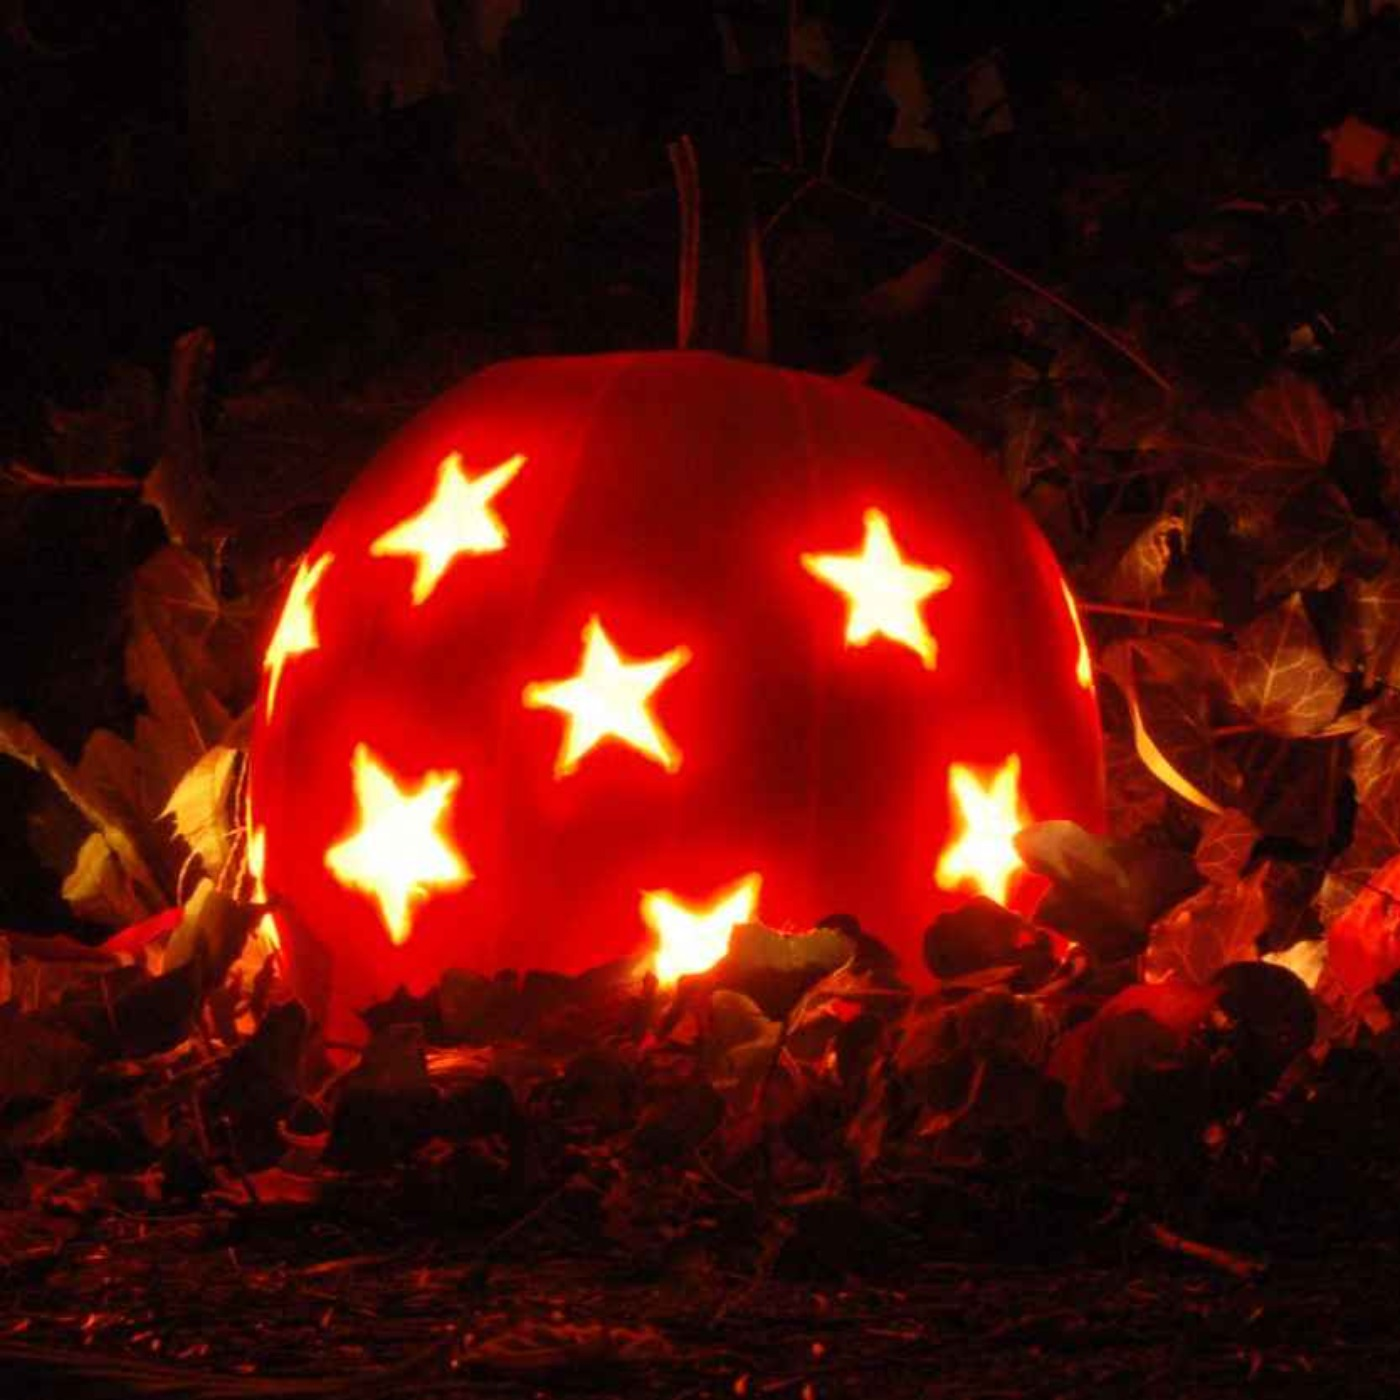 Les origines astronomiques d'Halloween (Astrozoom #8)